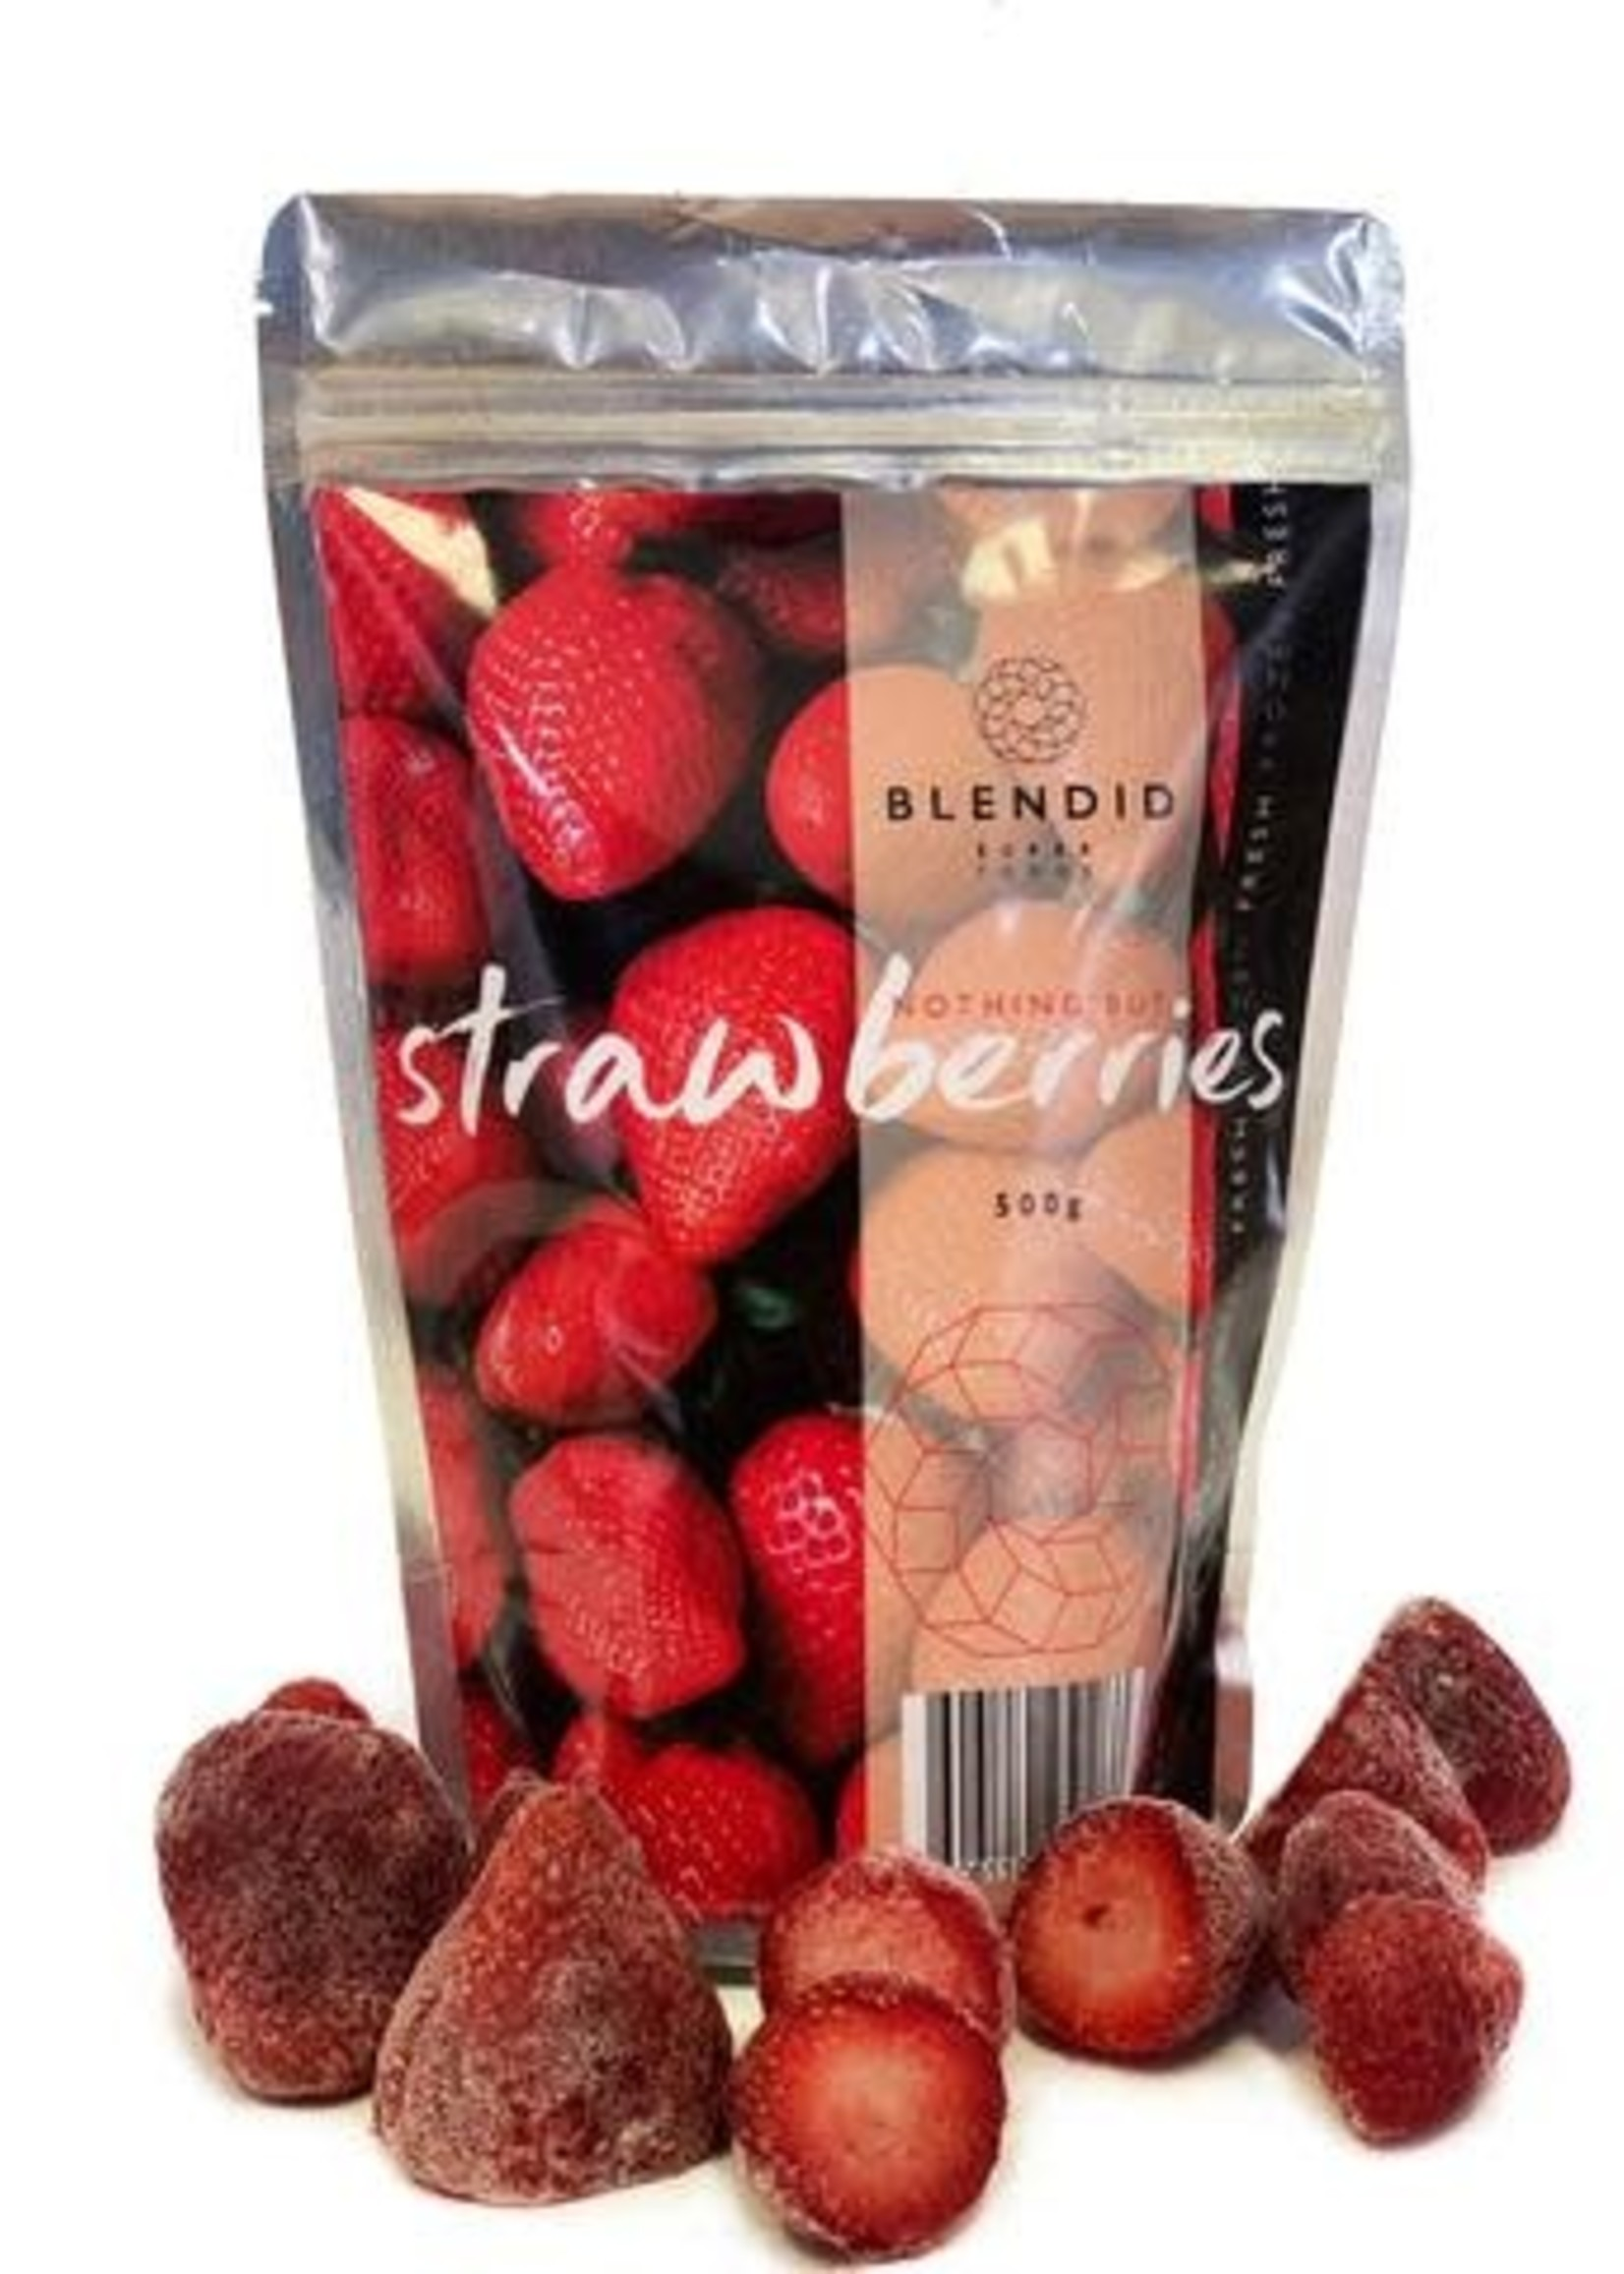 Blendid Blendid - Frozen strawberries